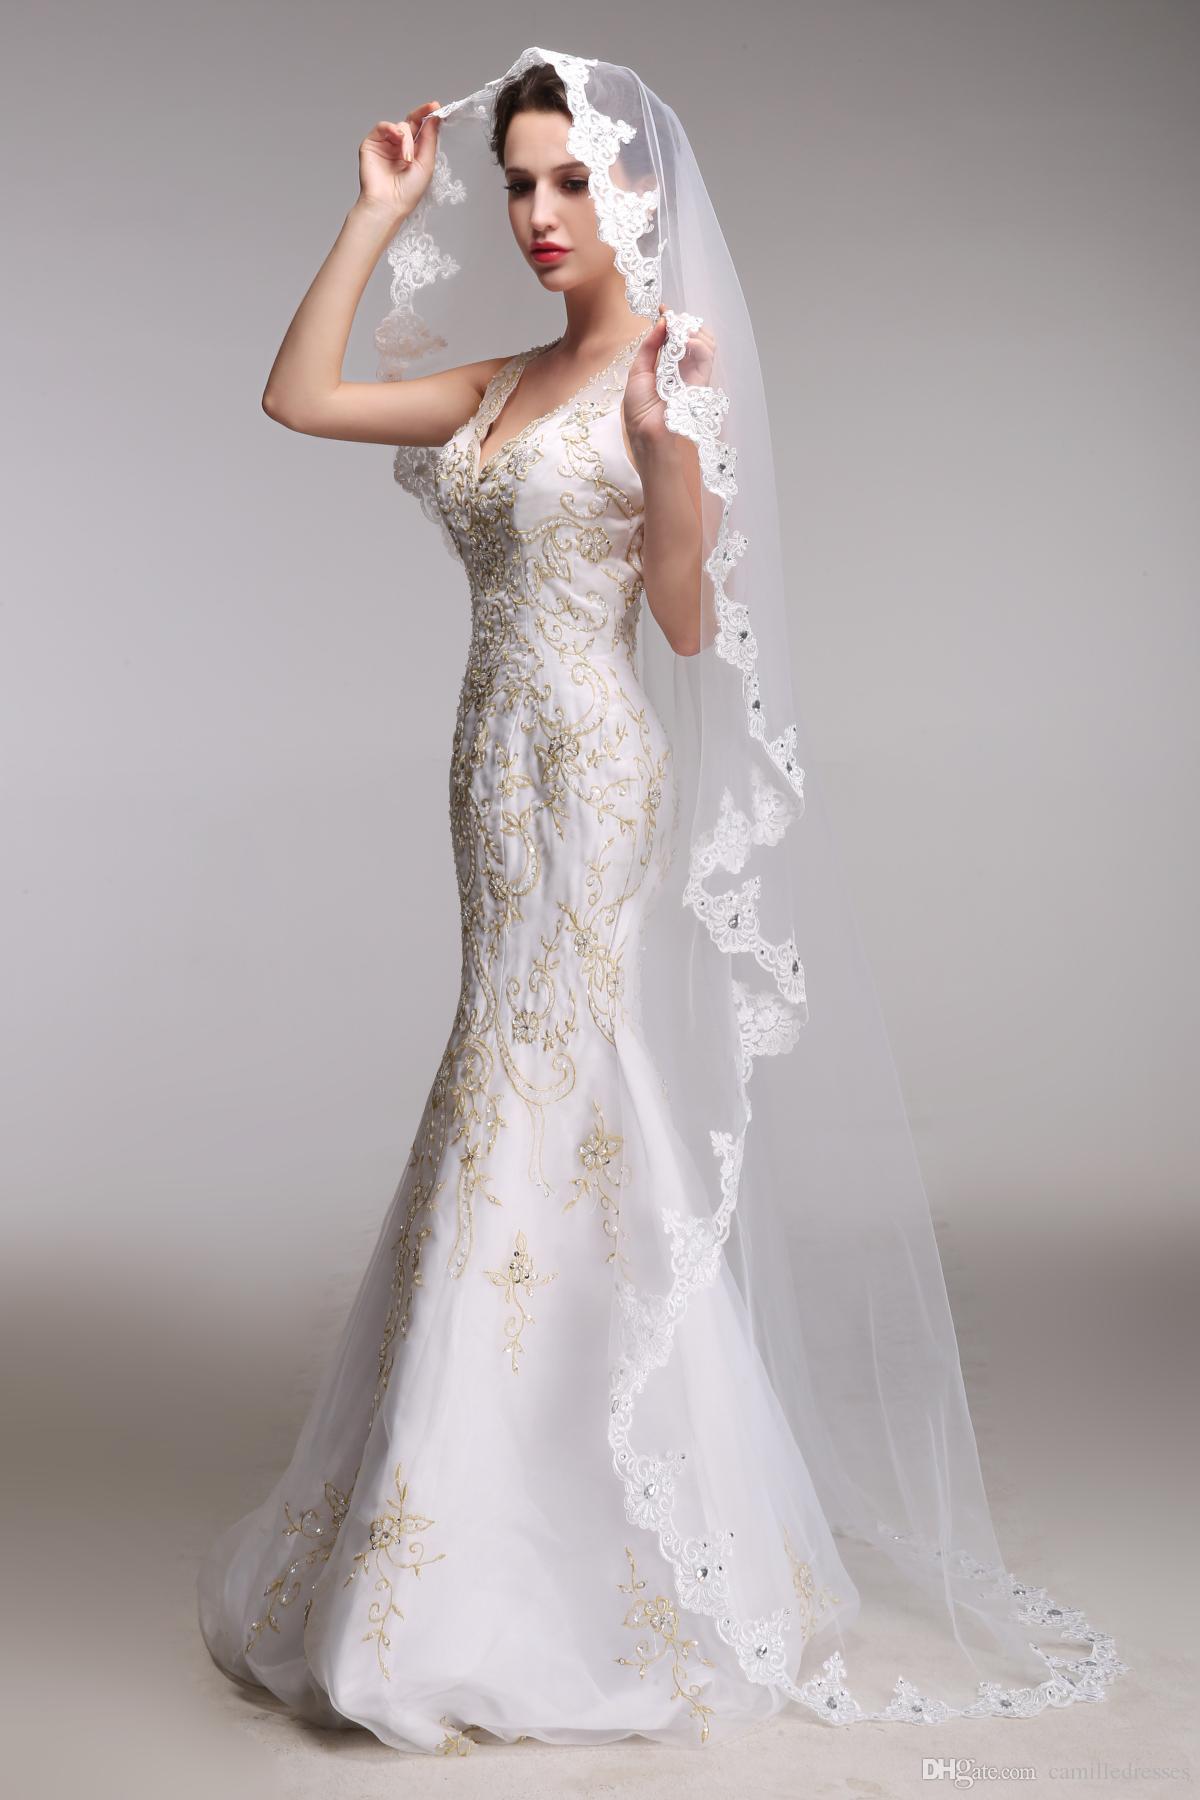 Wedding Bride Veil elegant wedding veils chapel length lace applique bridal veil accessories ivory with attractive stunning rhinestones bride ve